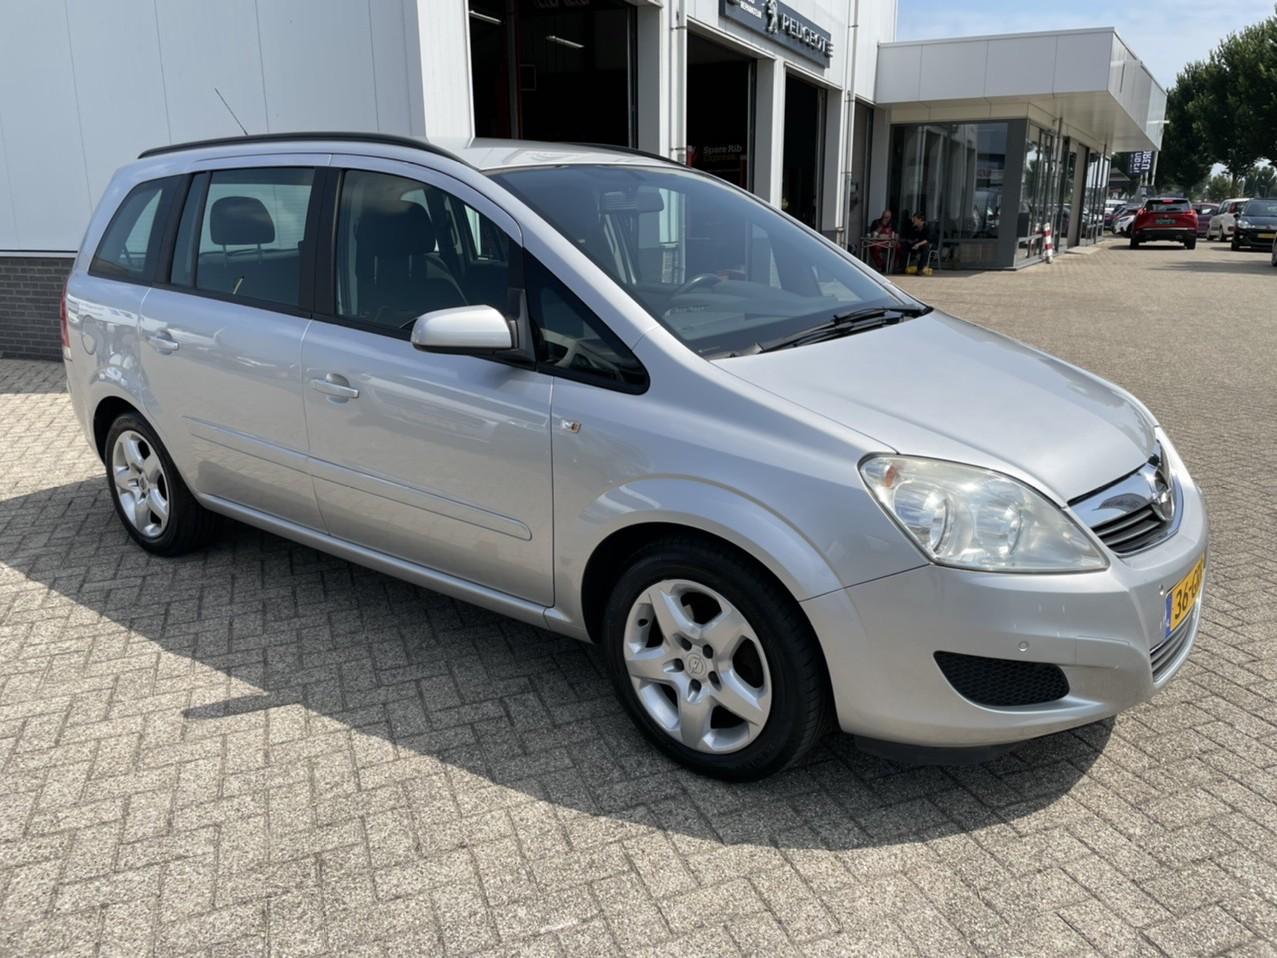 Opel Zafira Automaat 140 pk rijklaar prijs